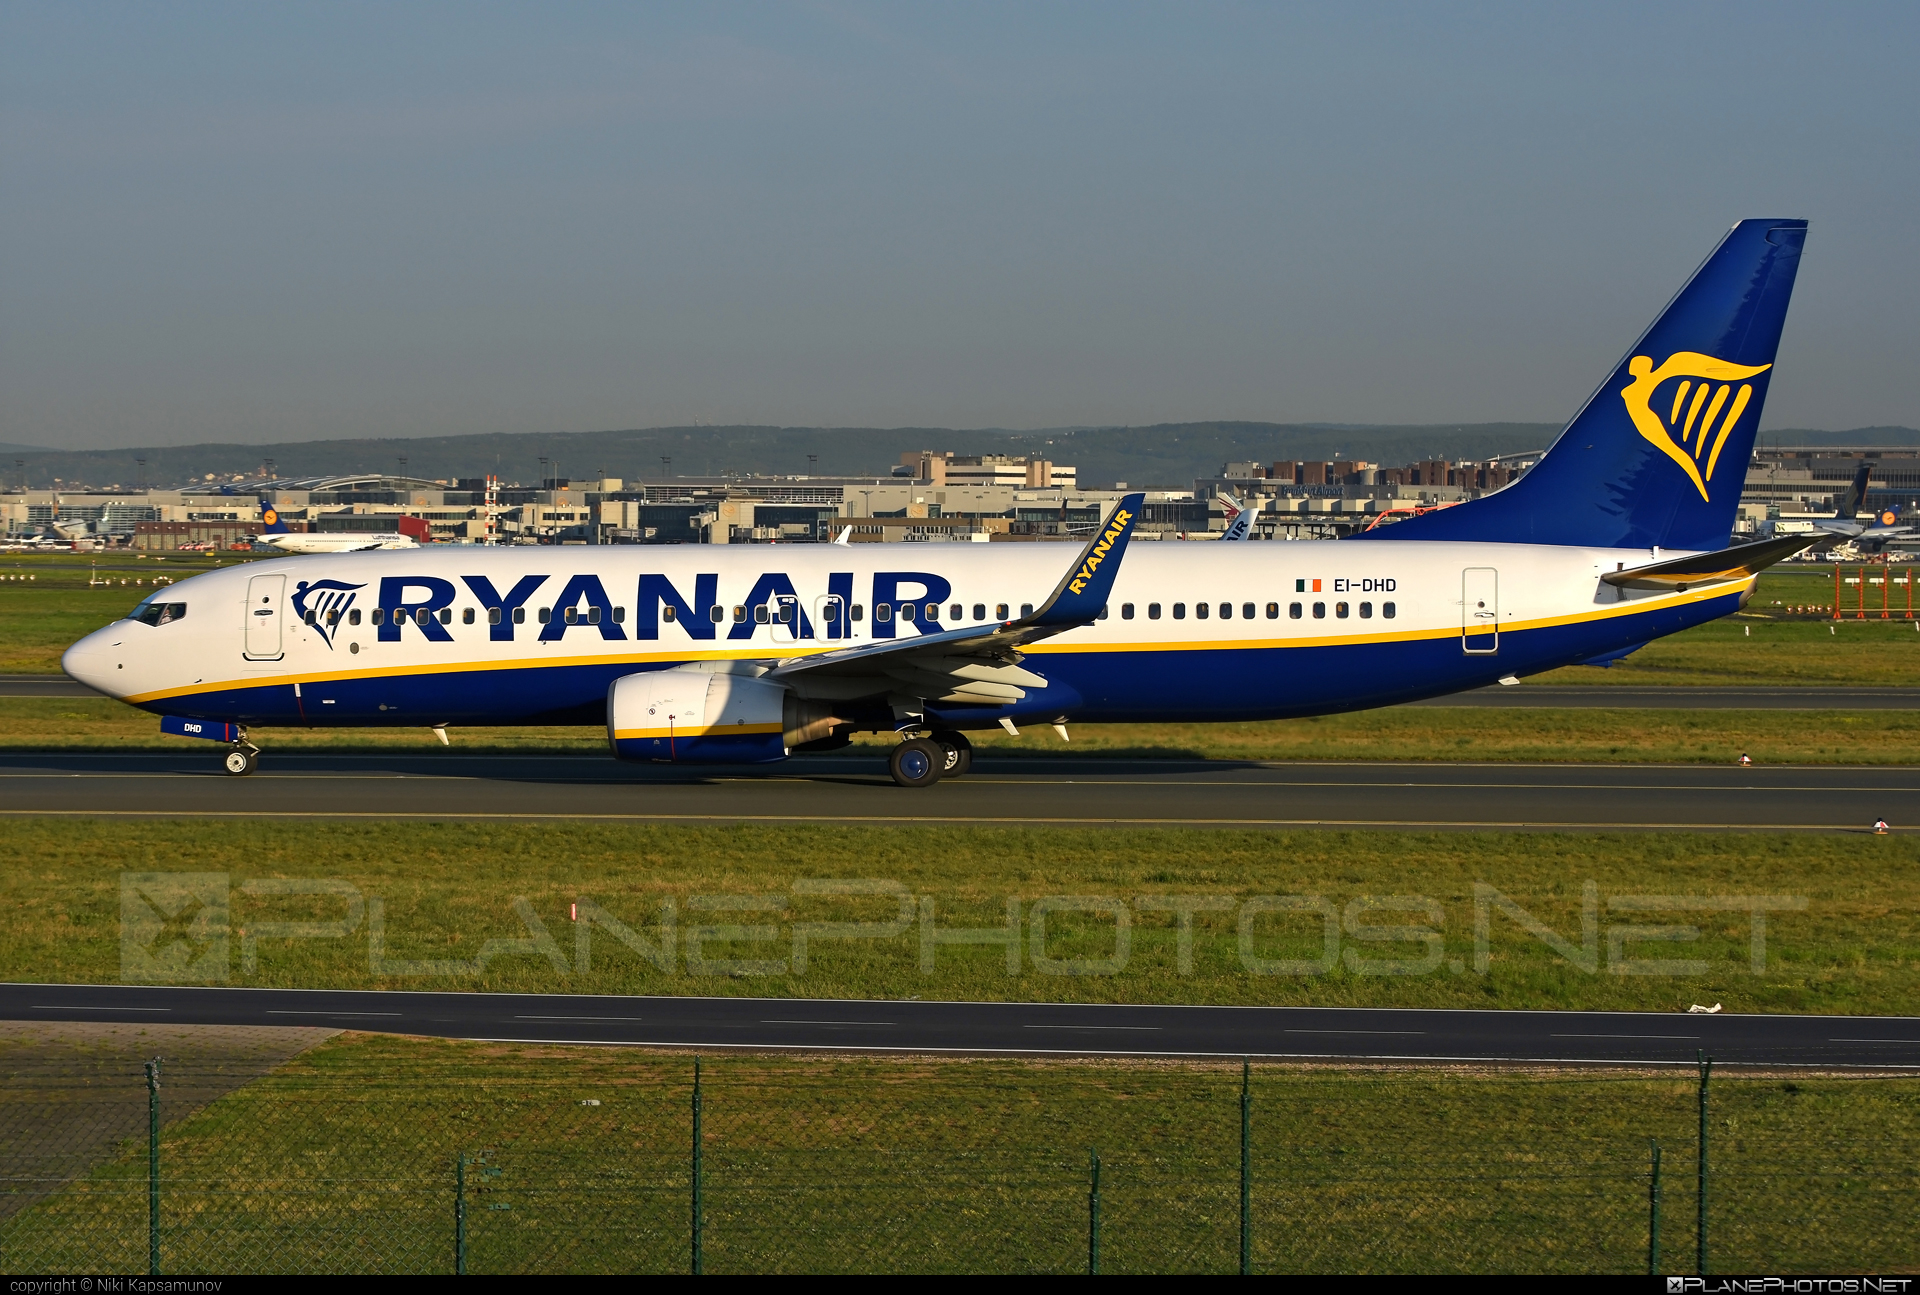 Boeing 737-800 - EI-DHD operated by Ryanair #b737 #b737nextgen #b737ng #boeing #boeing737 #ryanair